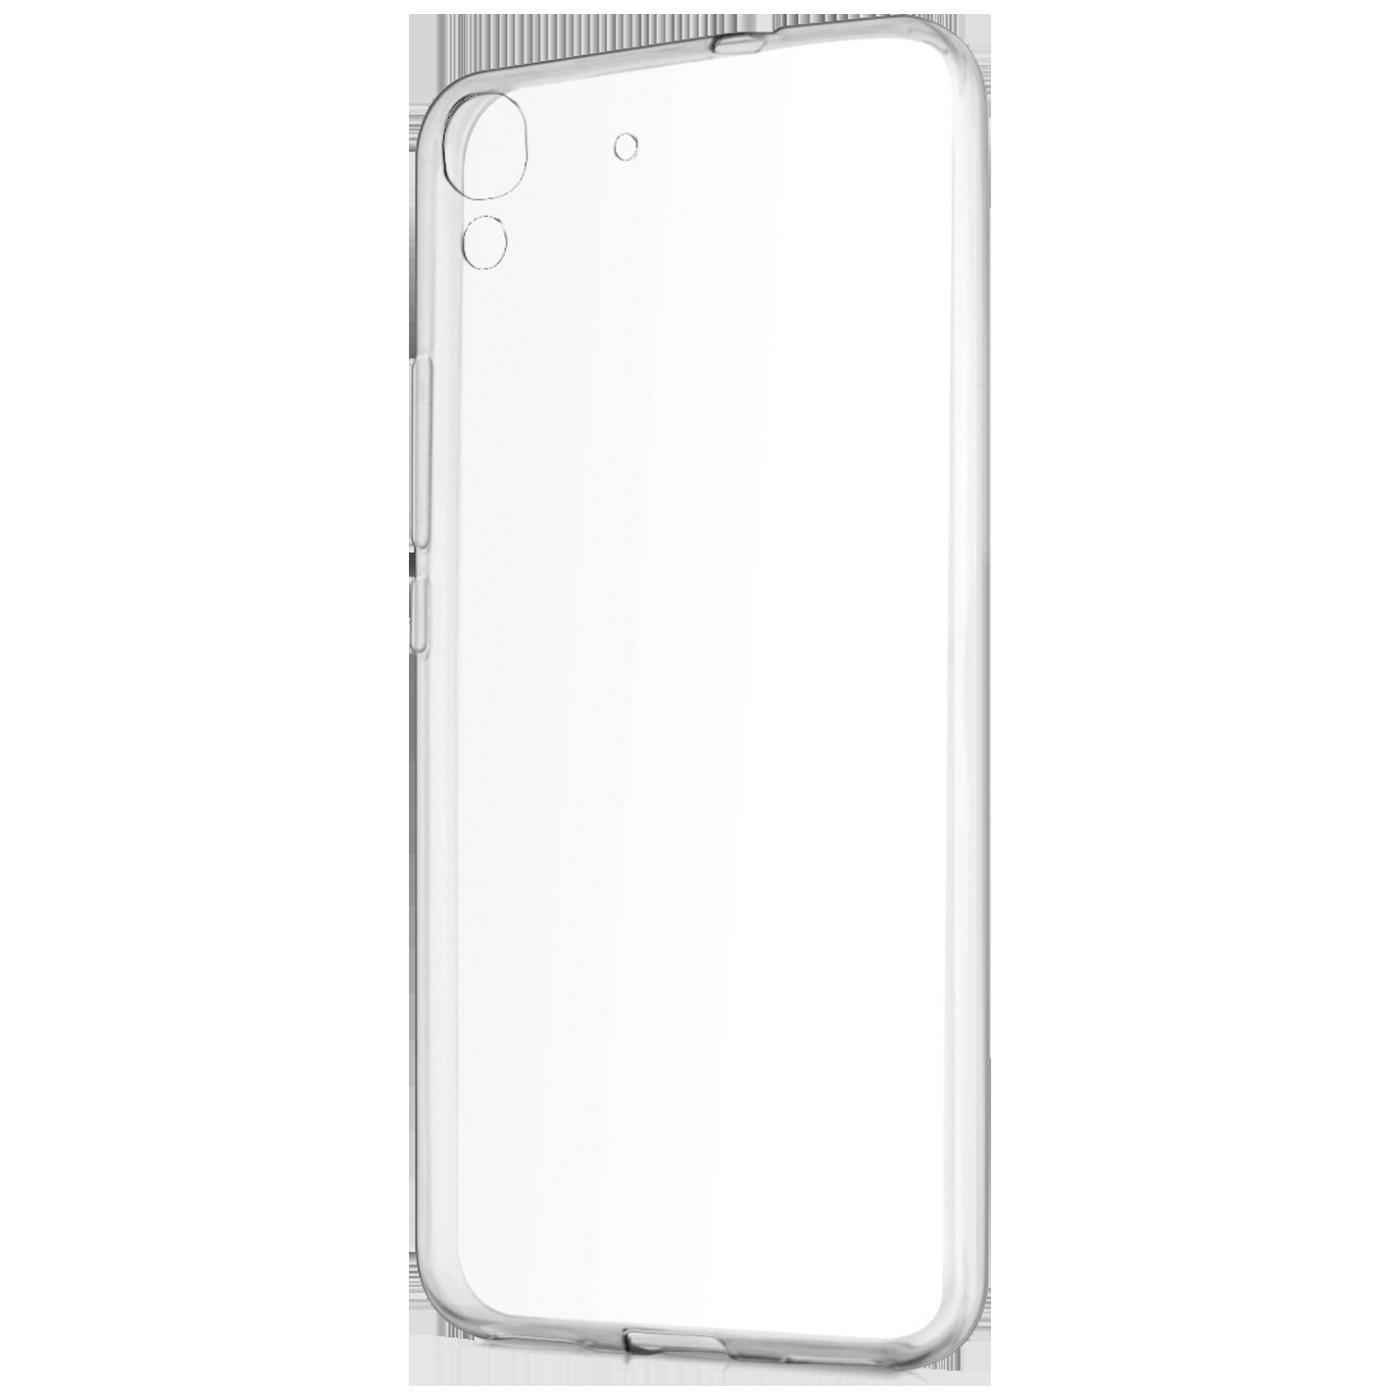 Futrola za mobitel Huawei Y6,silikonska,providna